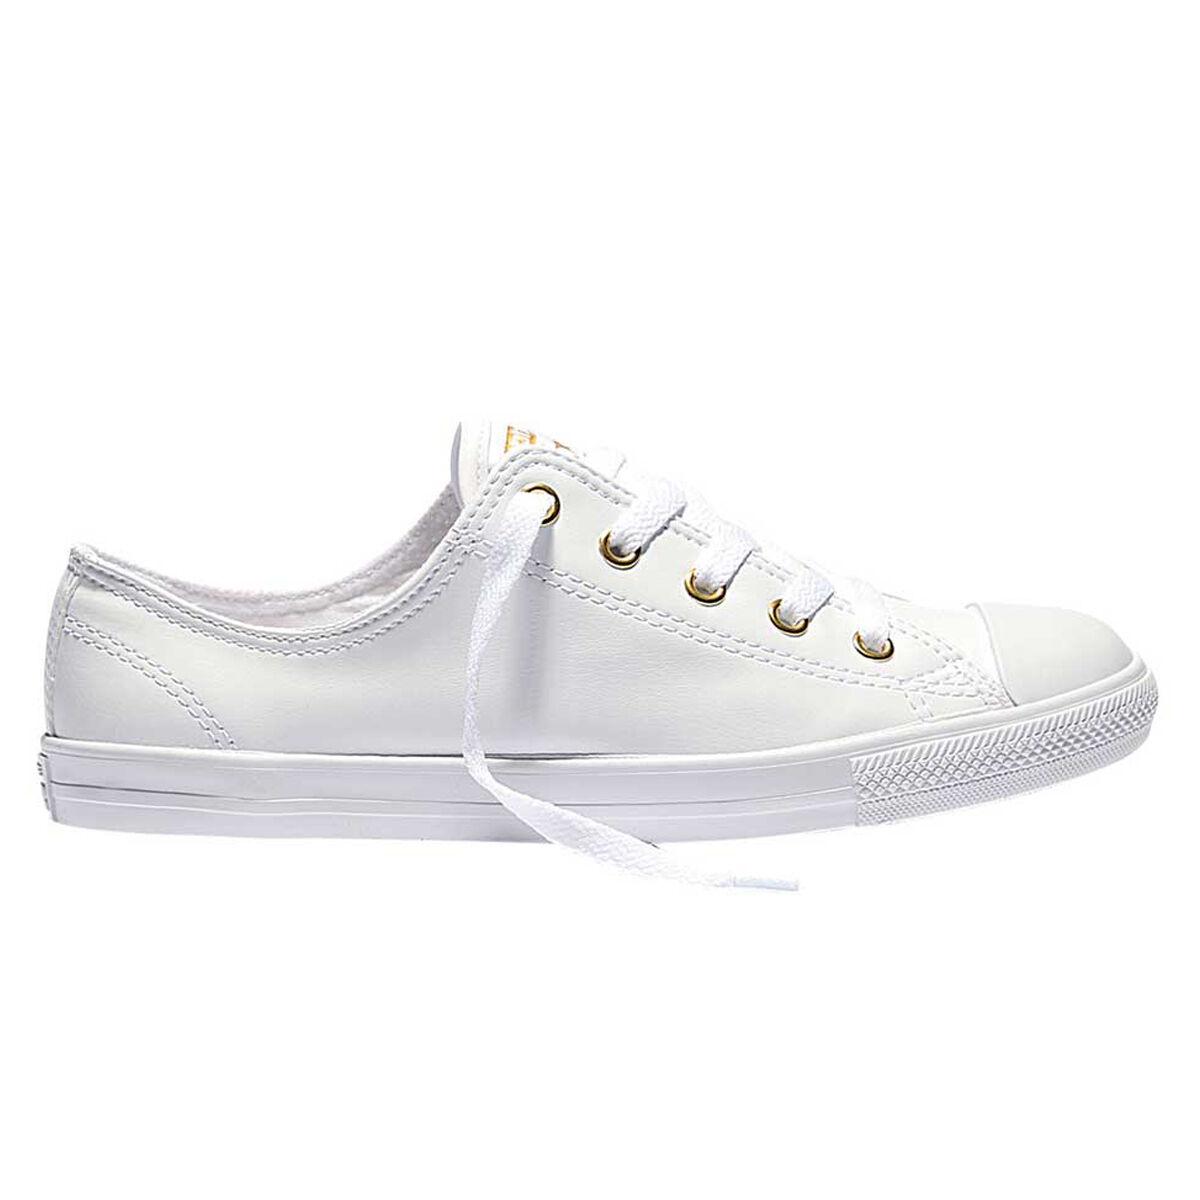 Taylor Chuck Womens Shoes Star Converse White All Dainty Casual bg6Yy7vf